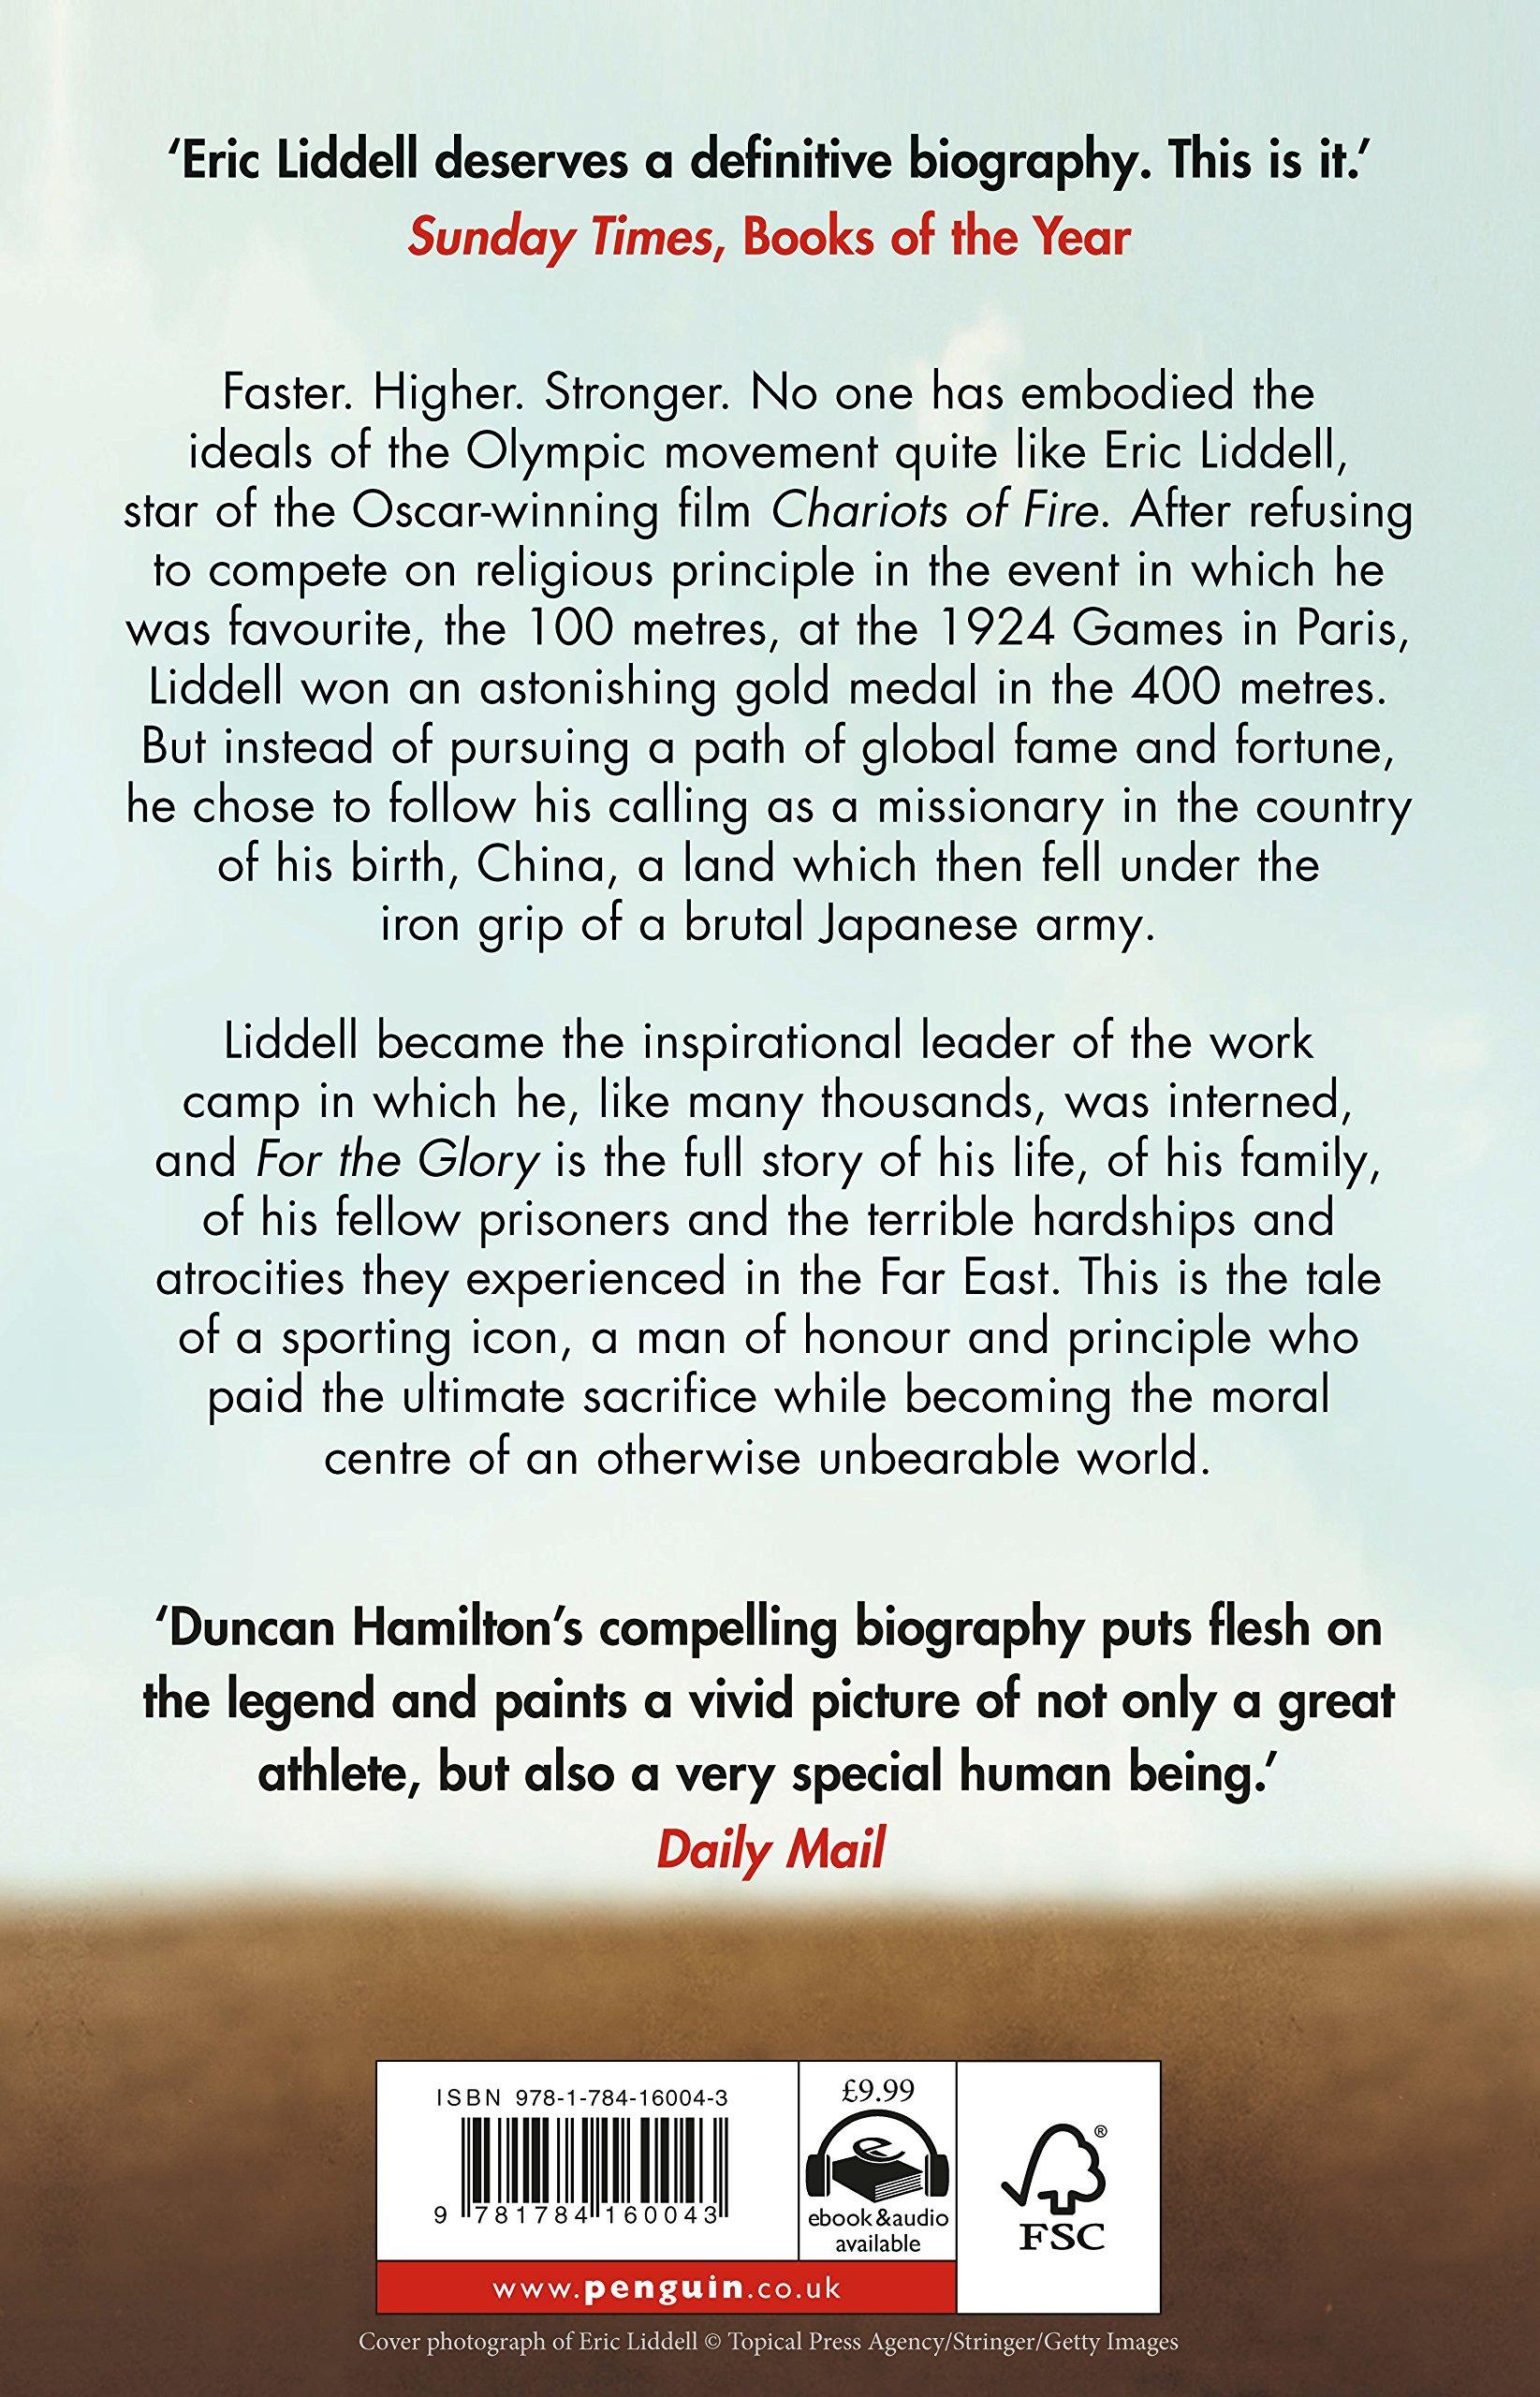 For the Glory: The Life of Eric Liddell: Amazon.de: Duncan Hamilton:  Fremdsprachige Bücher